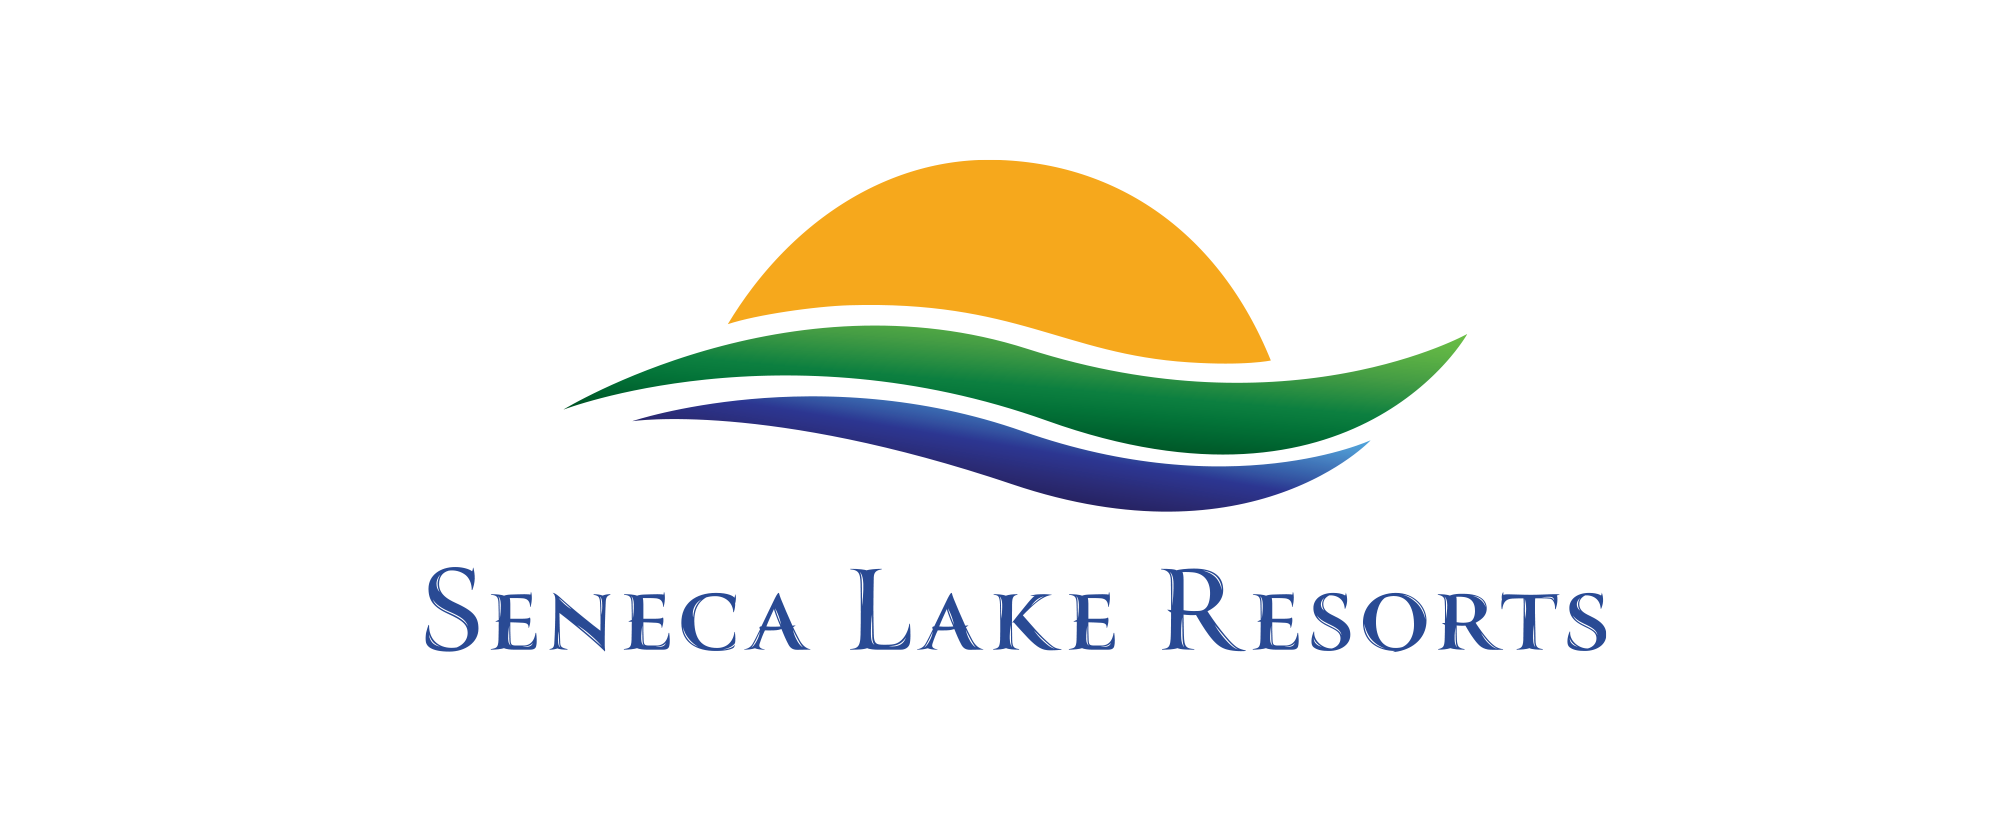 Seneca Lake Resorts Identity Inhouse Design